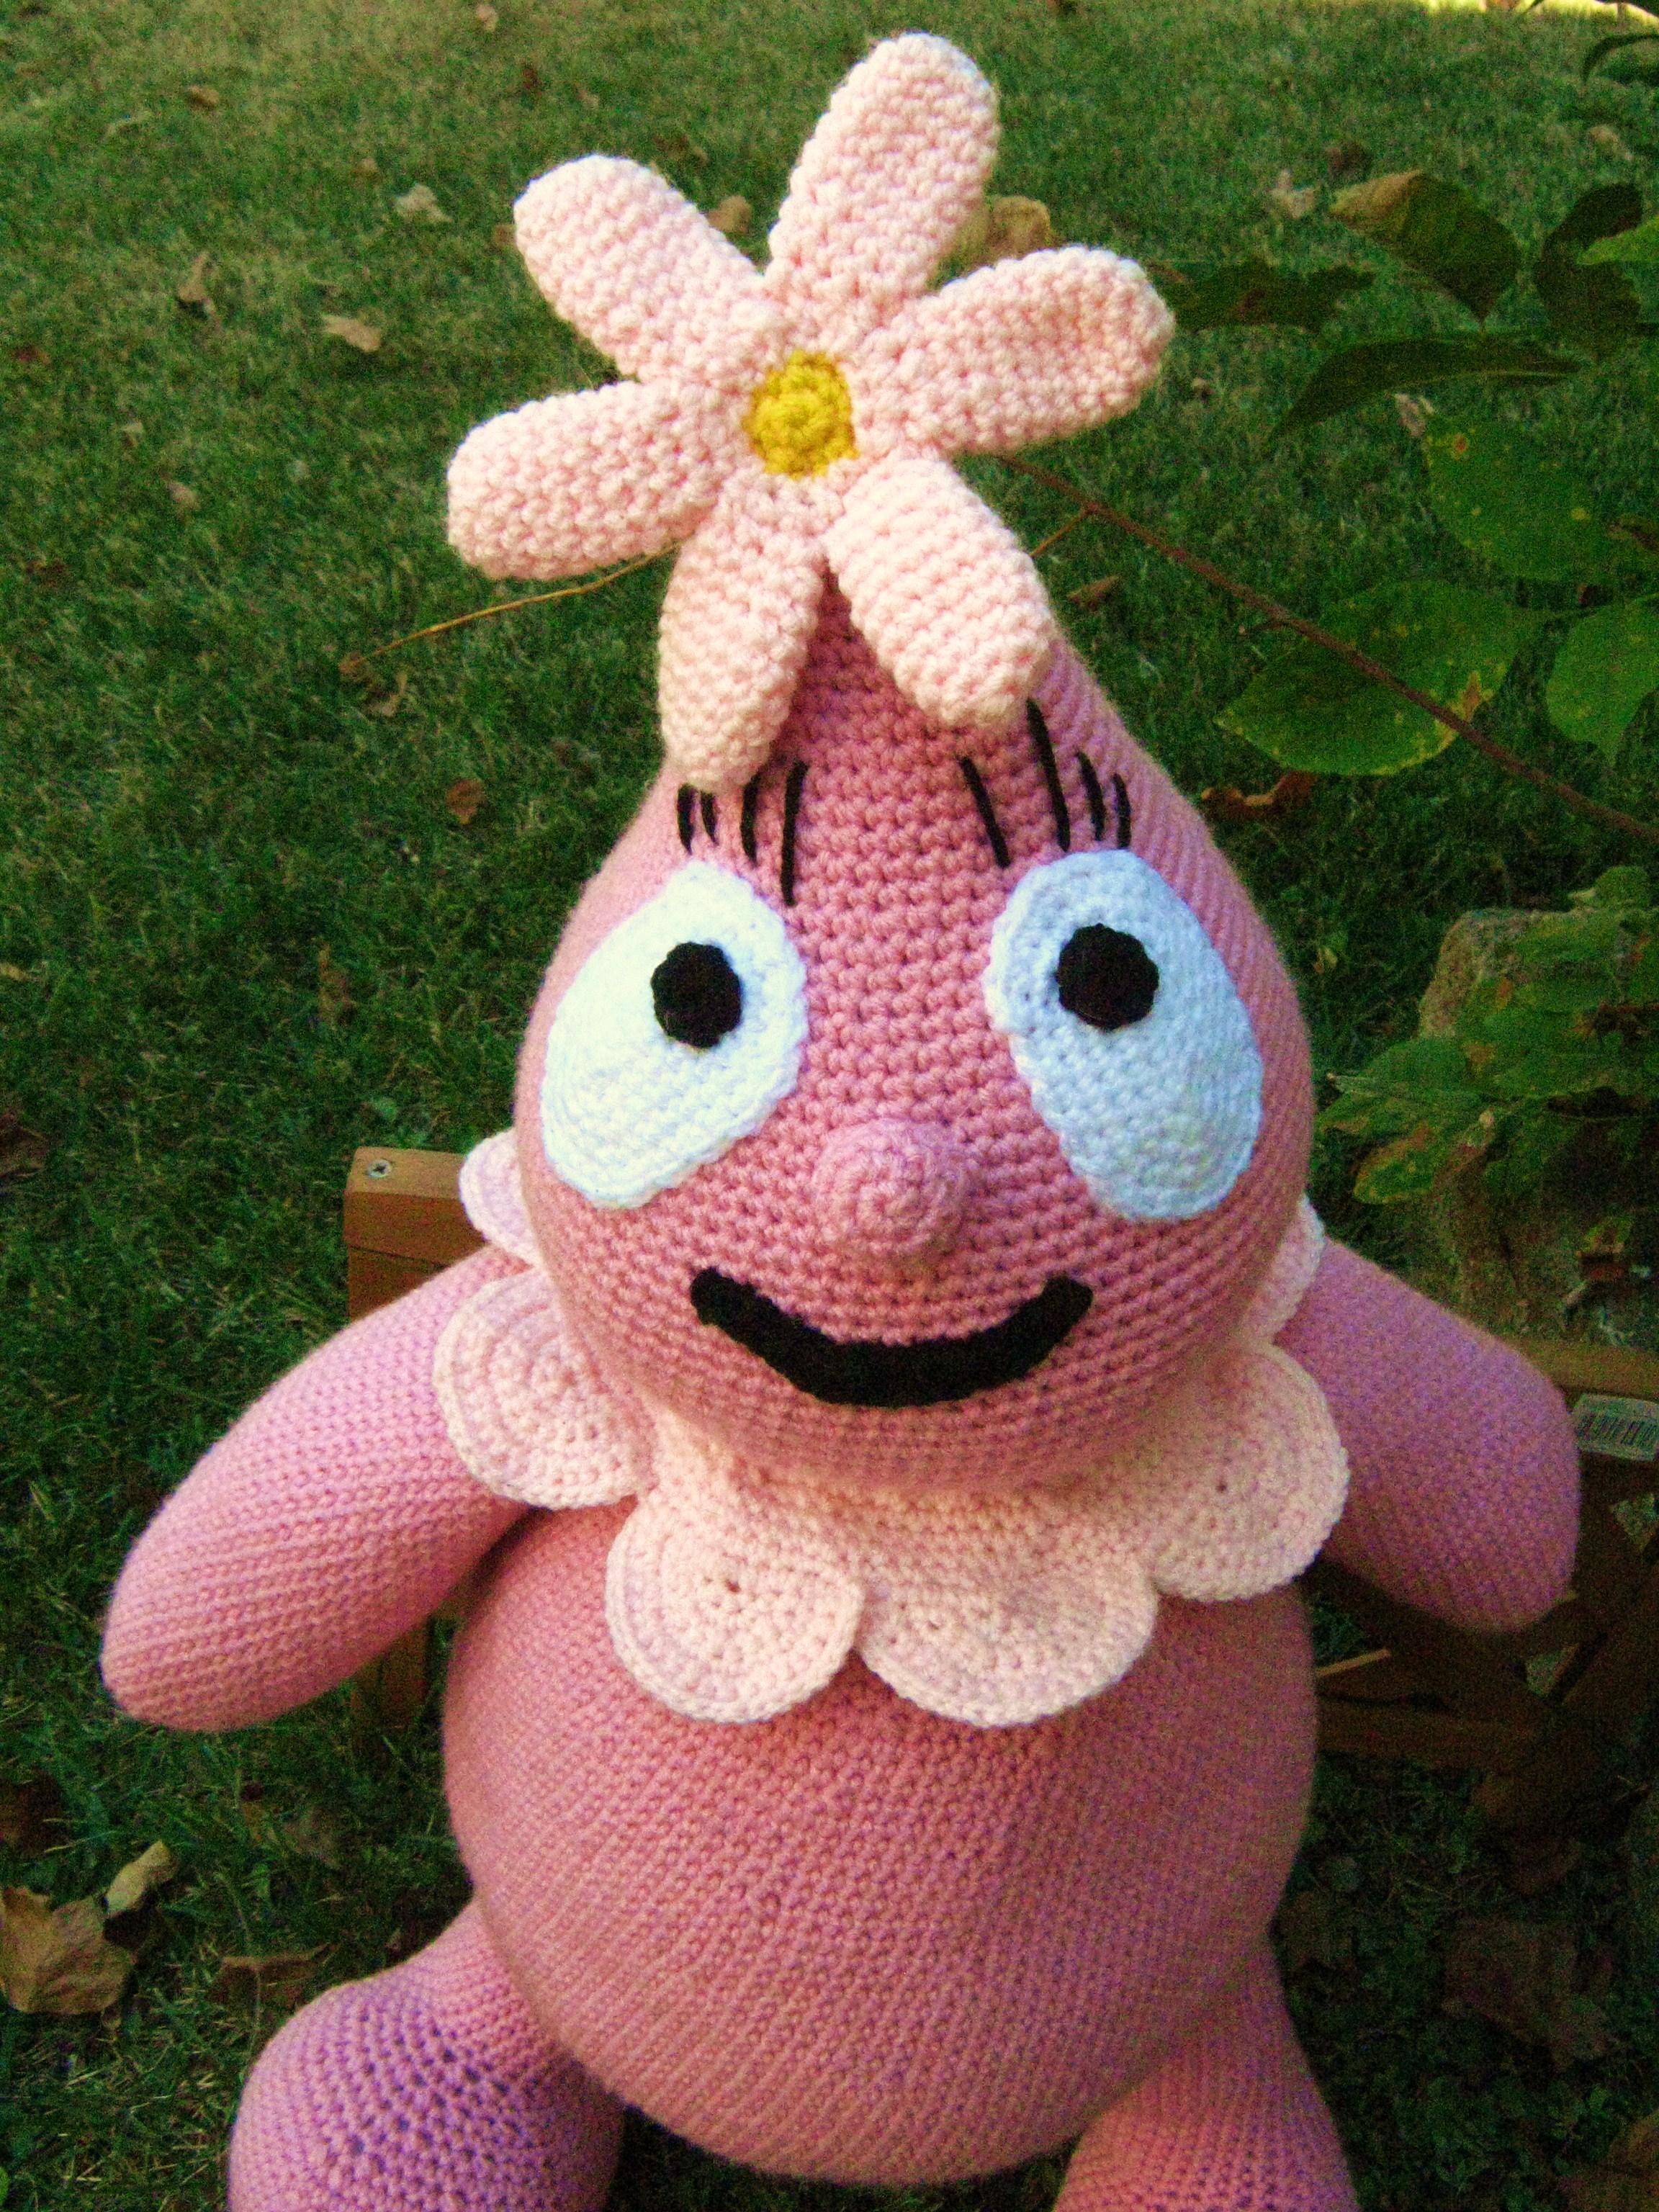 Crocheted plush foofa large